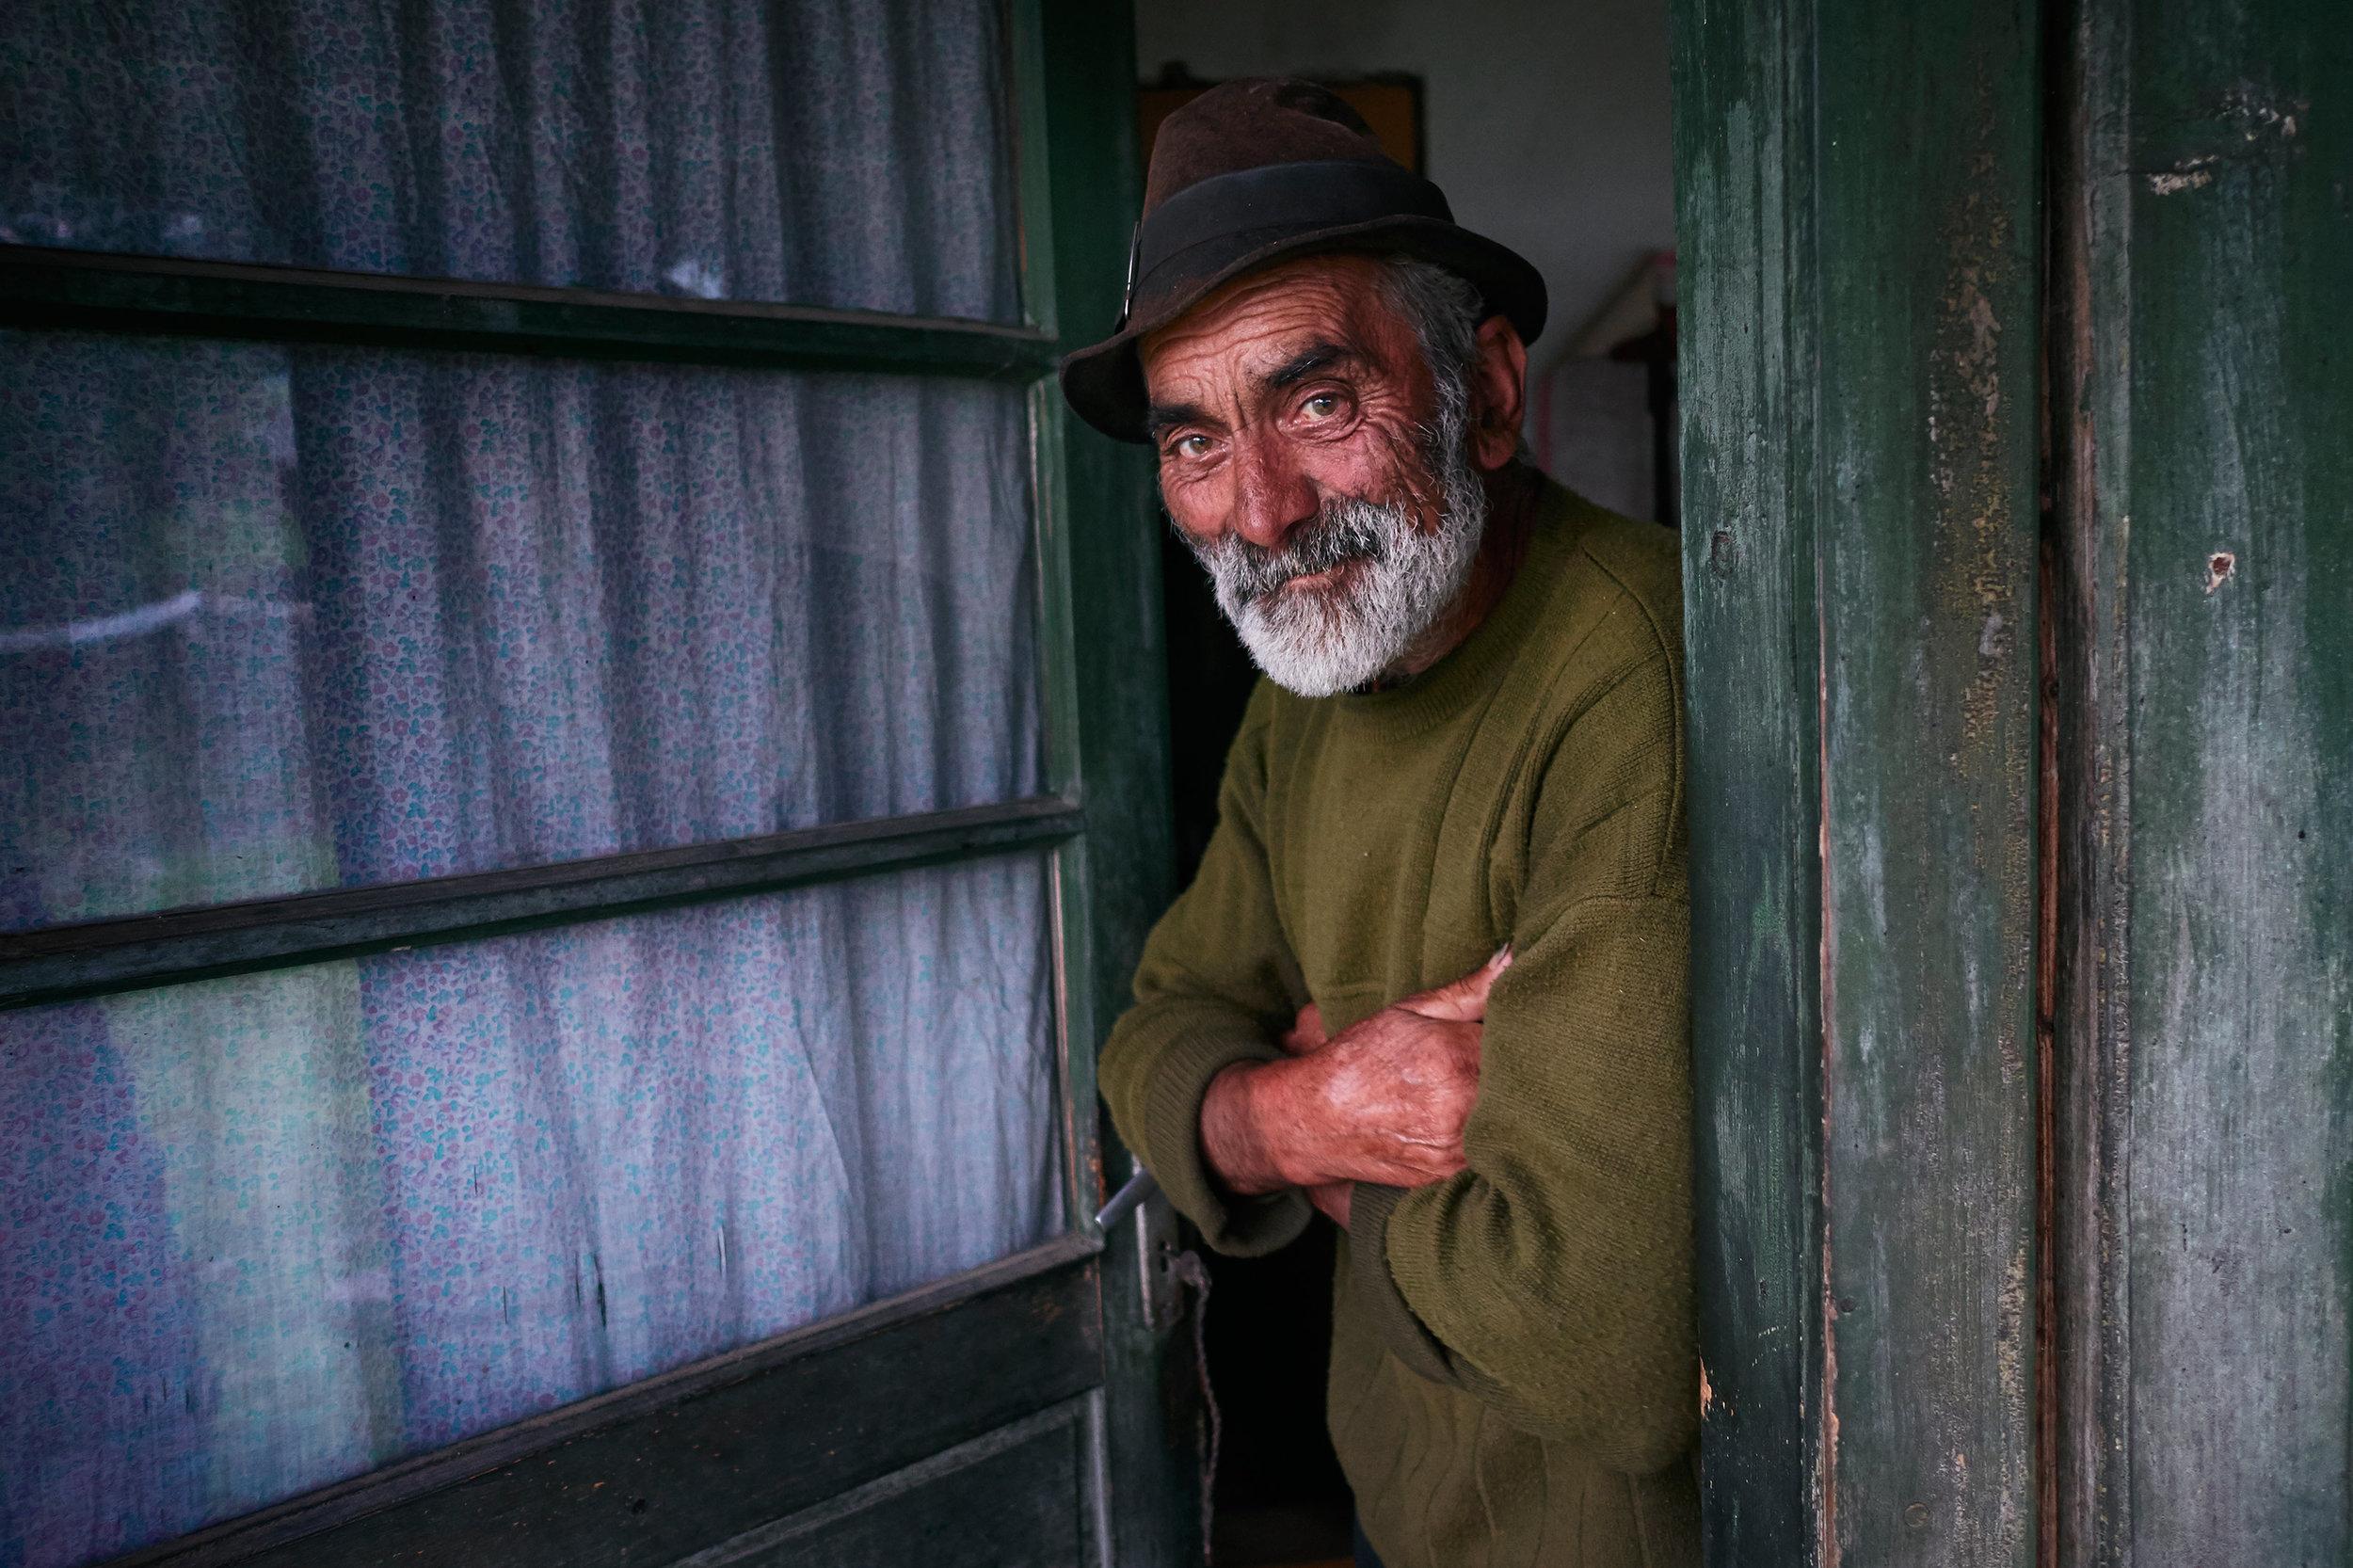 Maramures-Romania-portrait-of-an-elderly-man